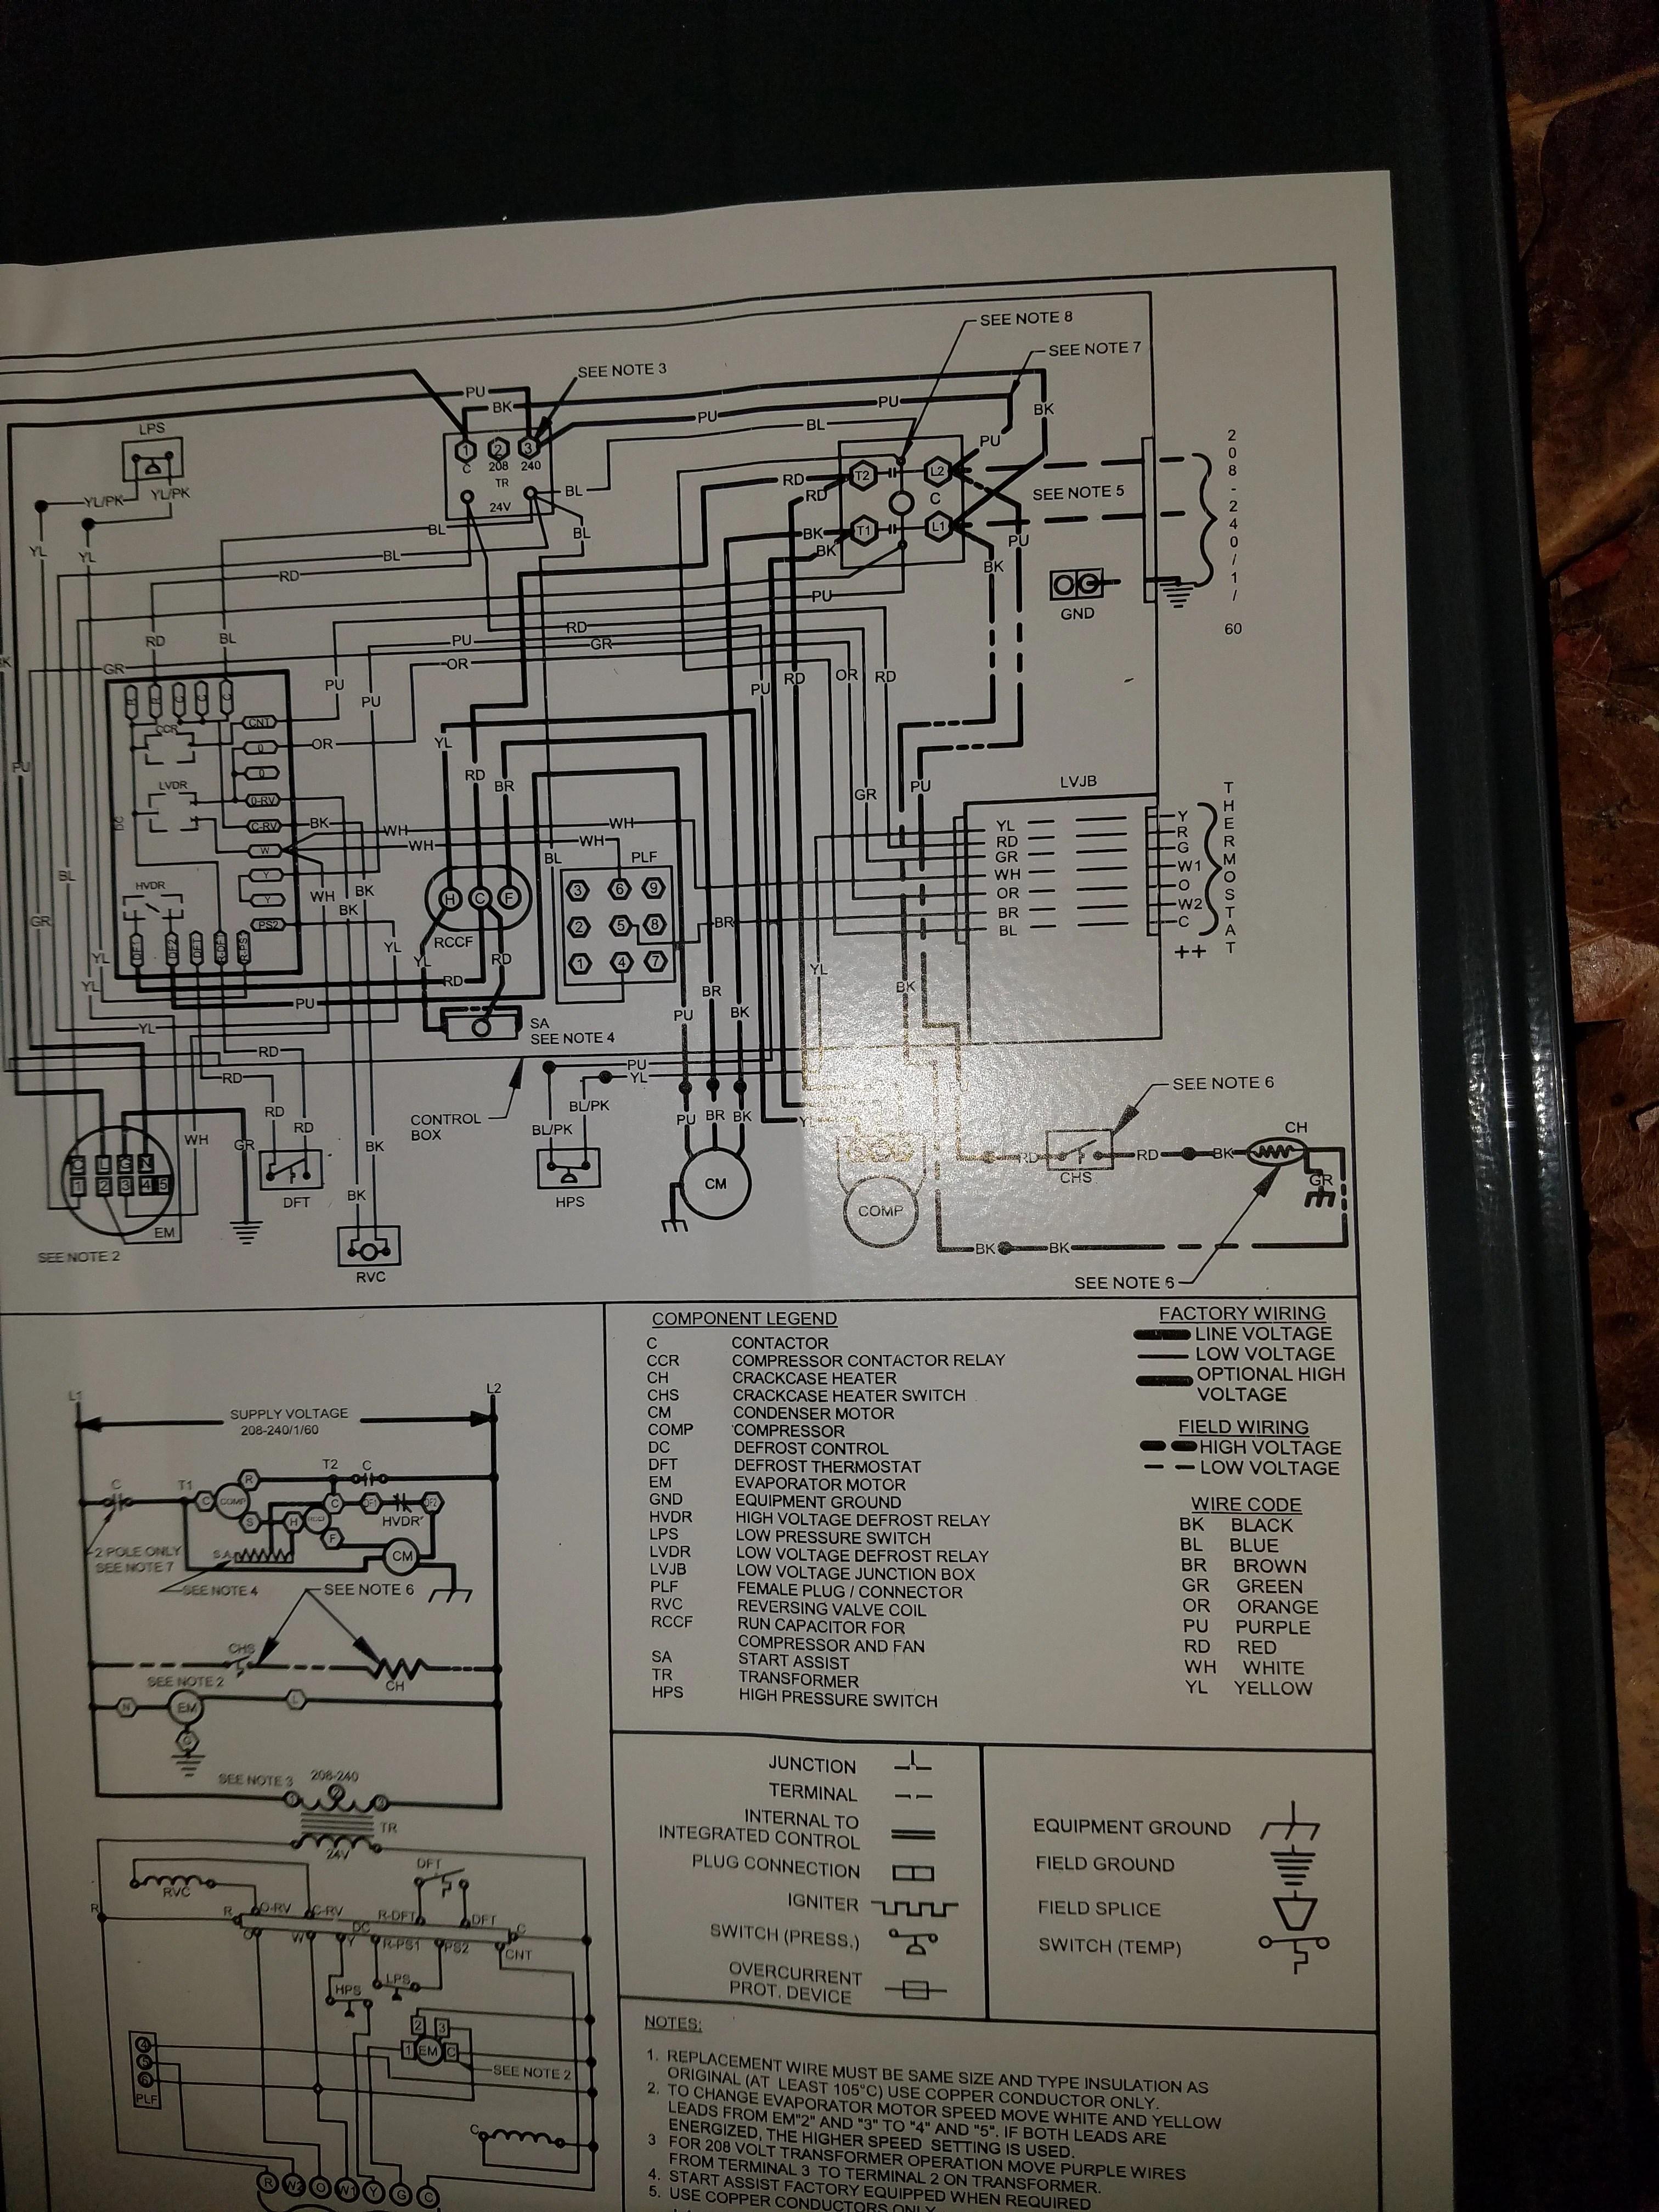 goodman package heat pump wiring diagram gmc sierra trailer need help unit gph1442 to hunter